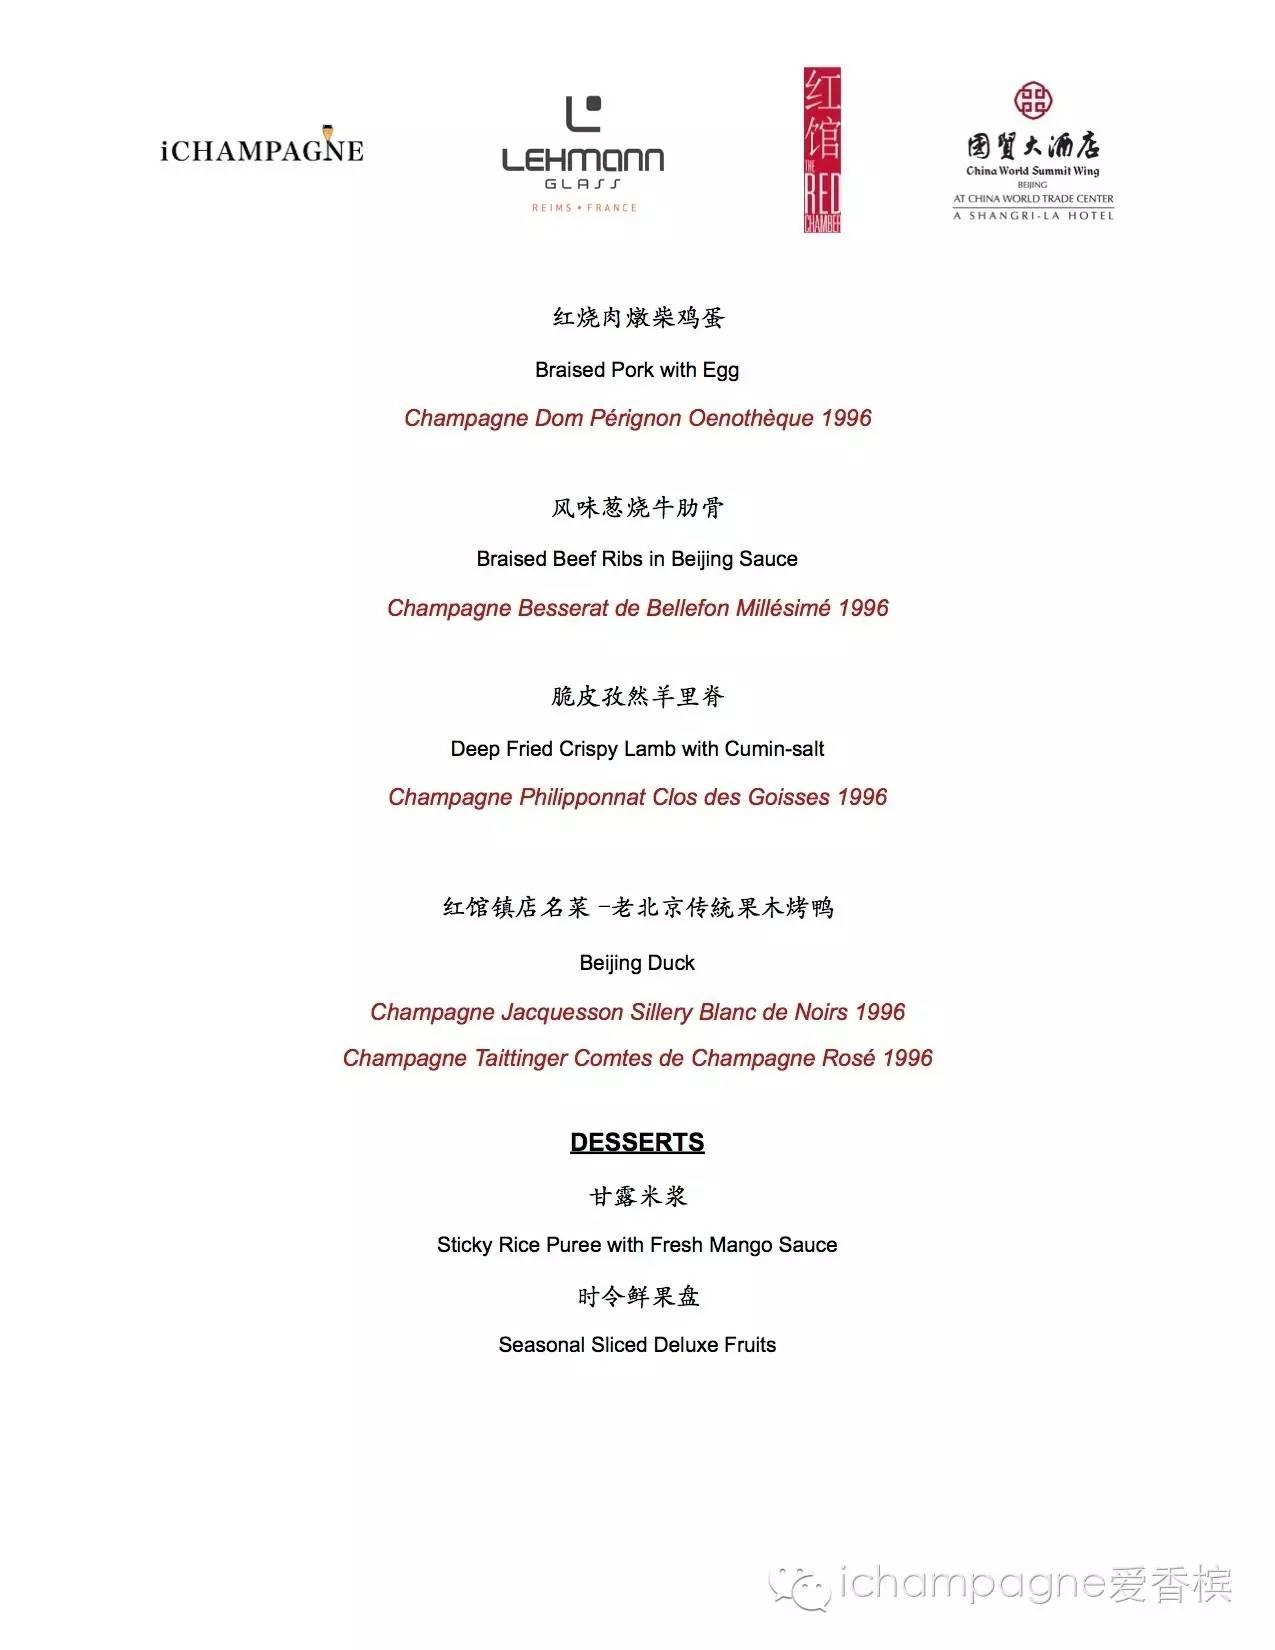 6.10 北京 I 1996 Grand Champagne & 红馆北方菜 晚宴